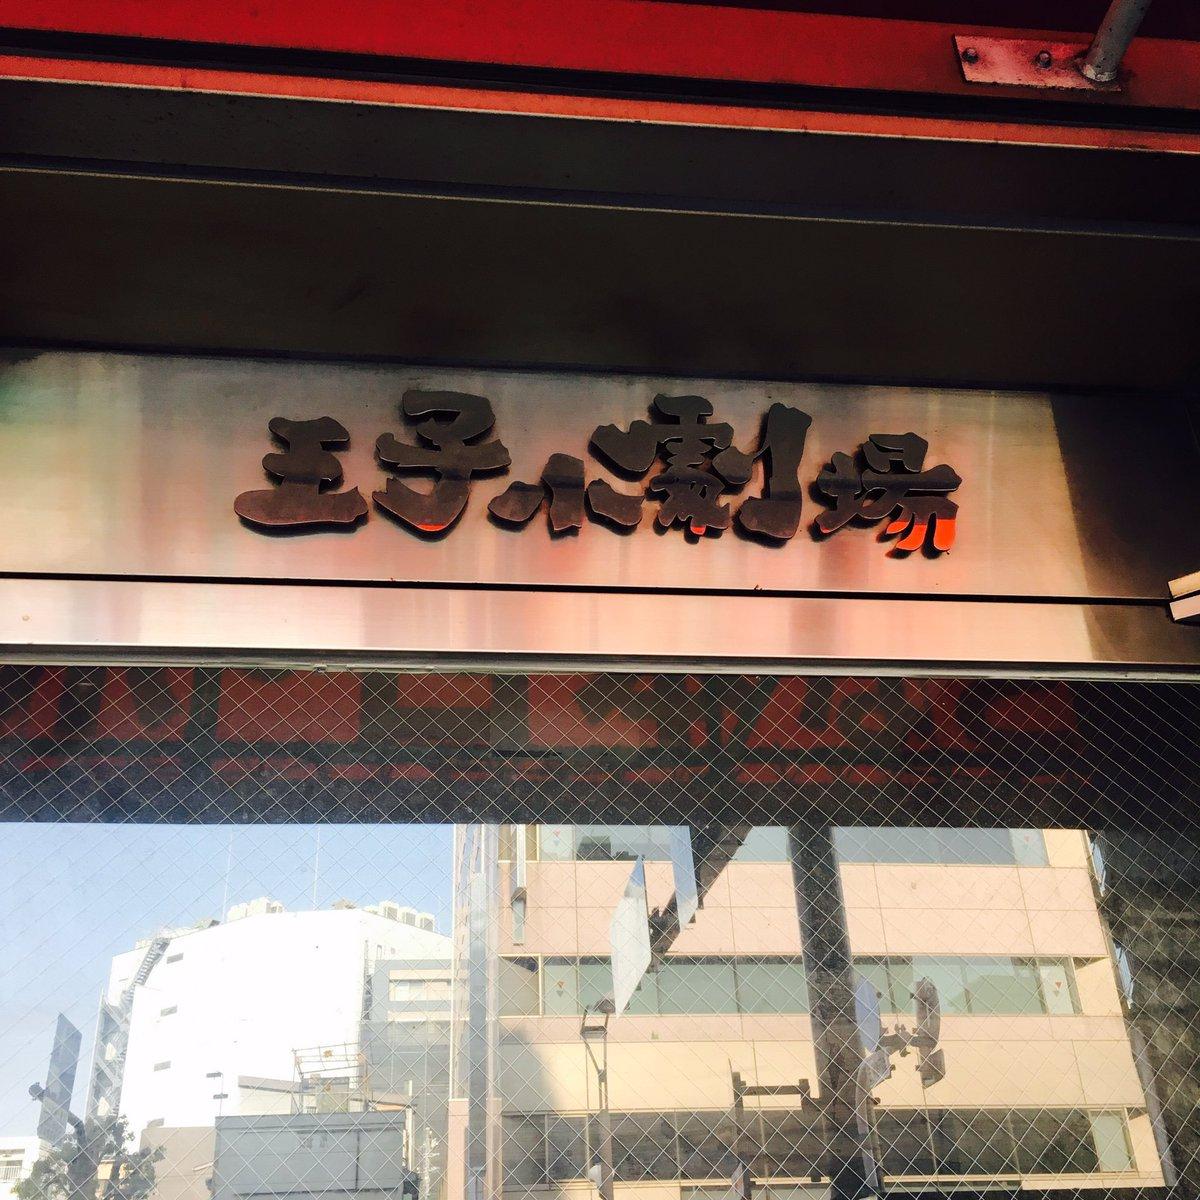 C tiv7suwaau hk